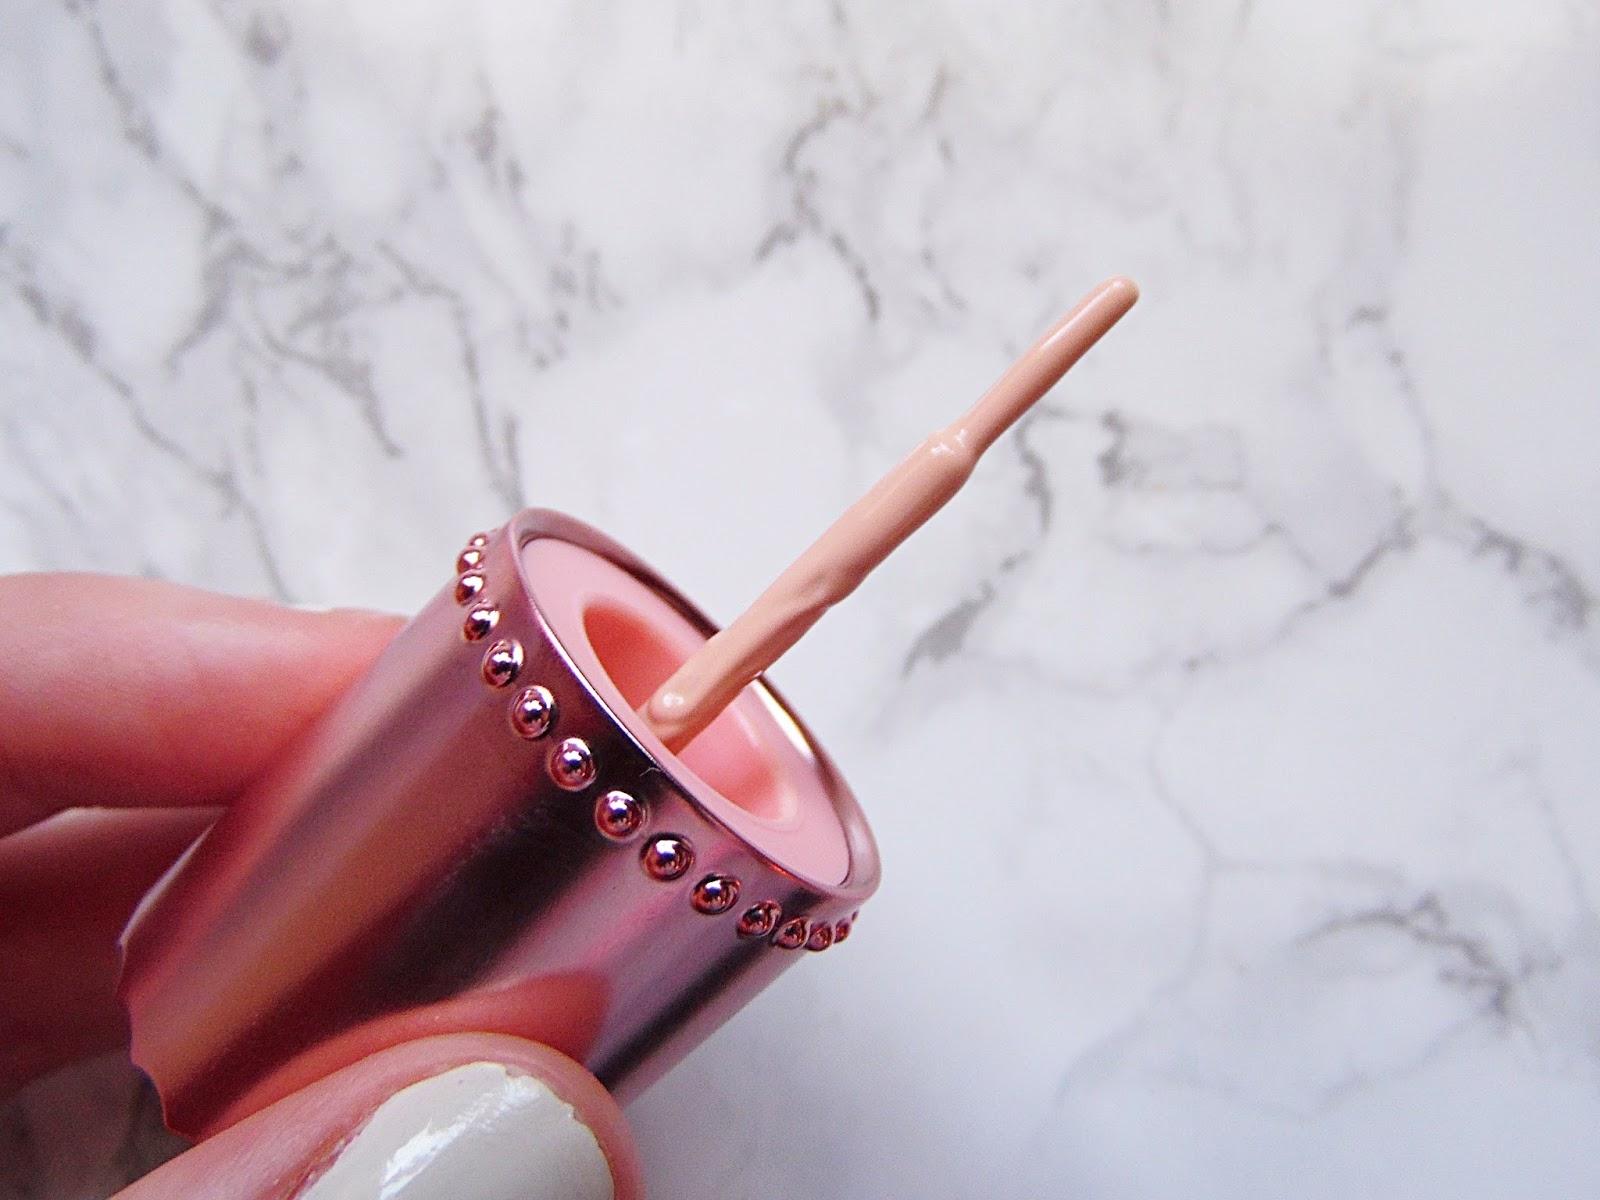 Benefit Dandelion Shy Beam